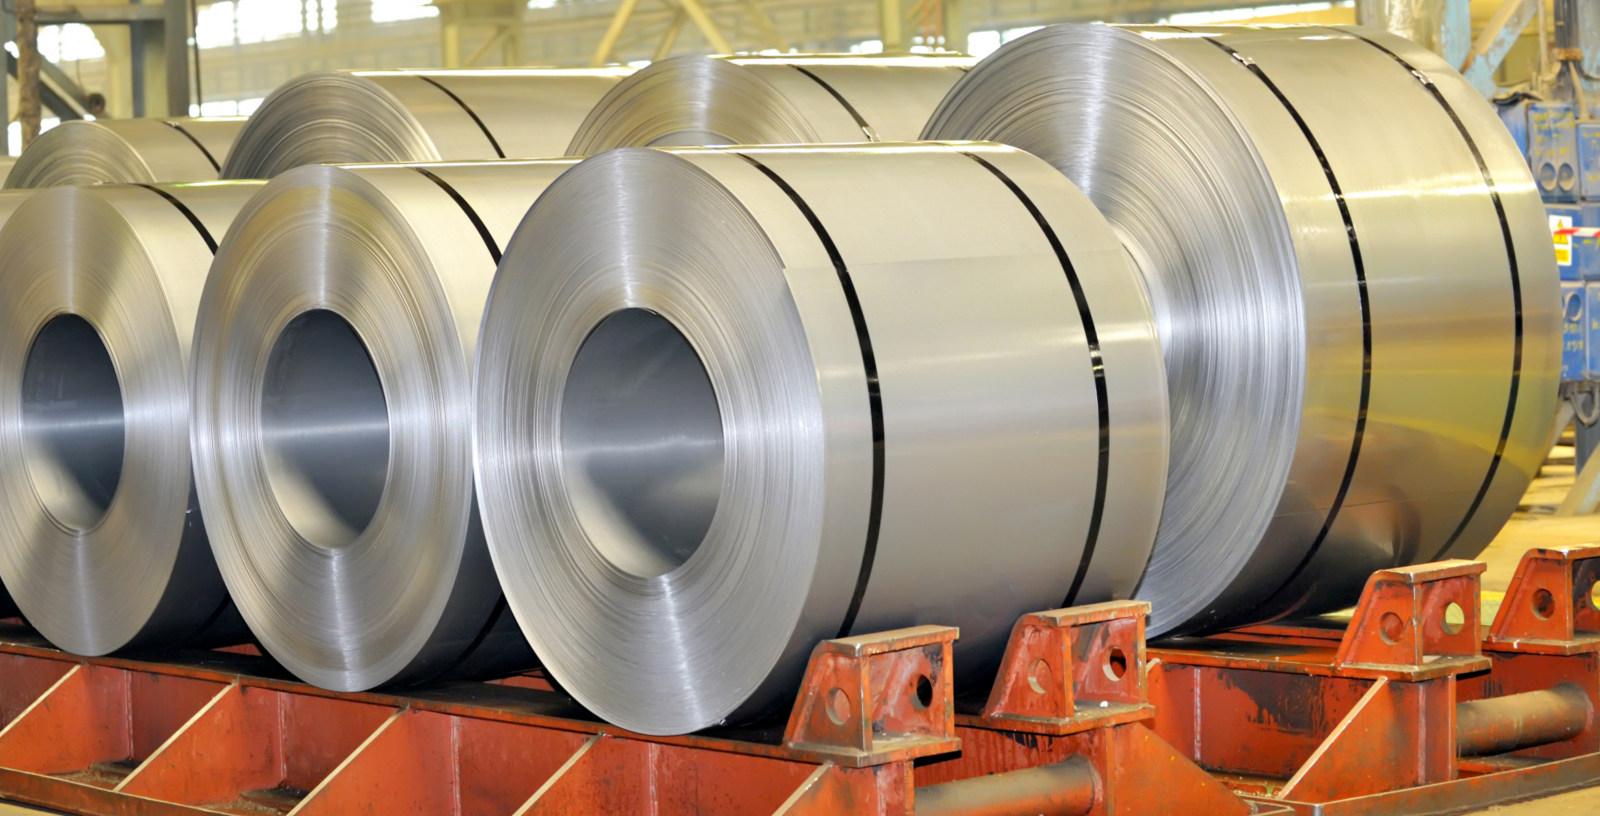 Aluminum_automotive_HRM_HTL_Maaden_Alcoa_Kiezad_UAE_SMS_SIEMAG_IDOM